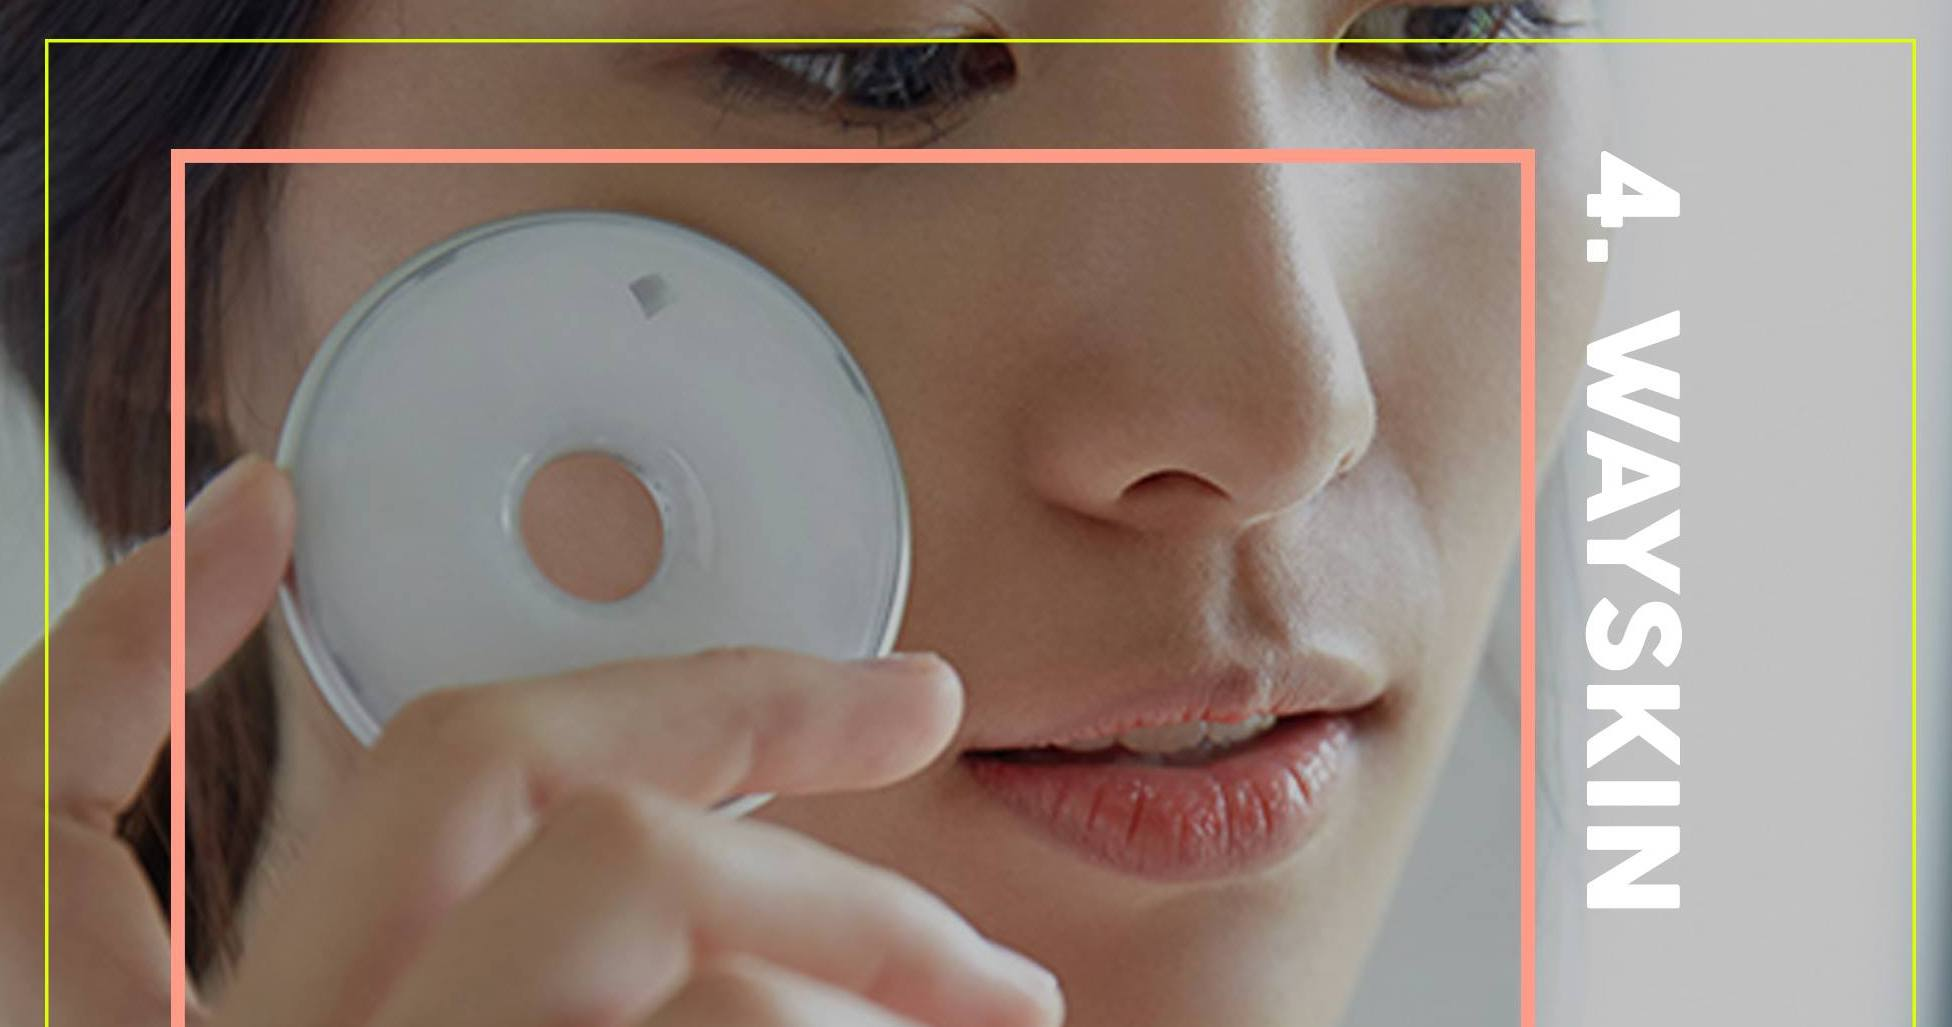 Ruckdee ชวนหยิบงานวิจัยลงจากหิ้งเอามาทำ Gadget ที่ใช้ได้จริงเพื่อสุขภาพ